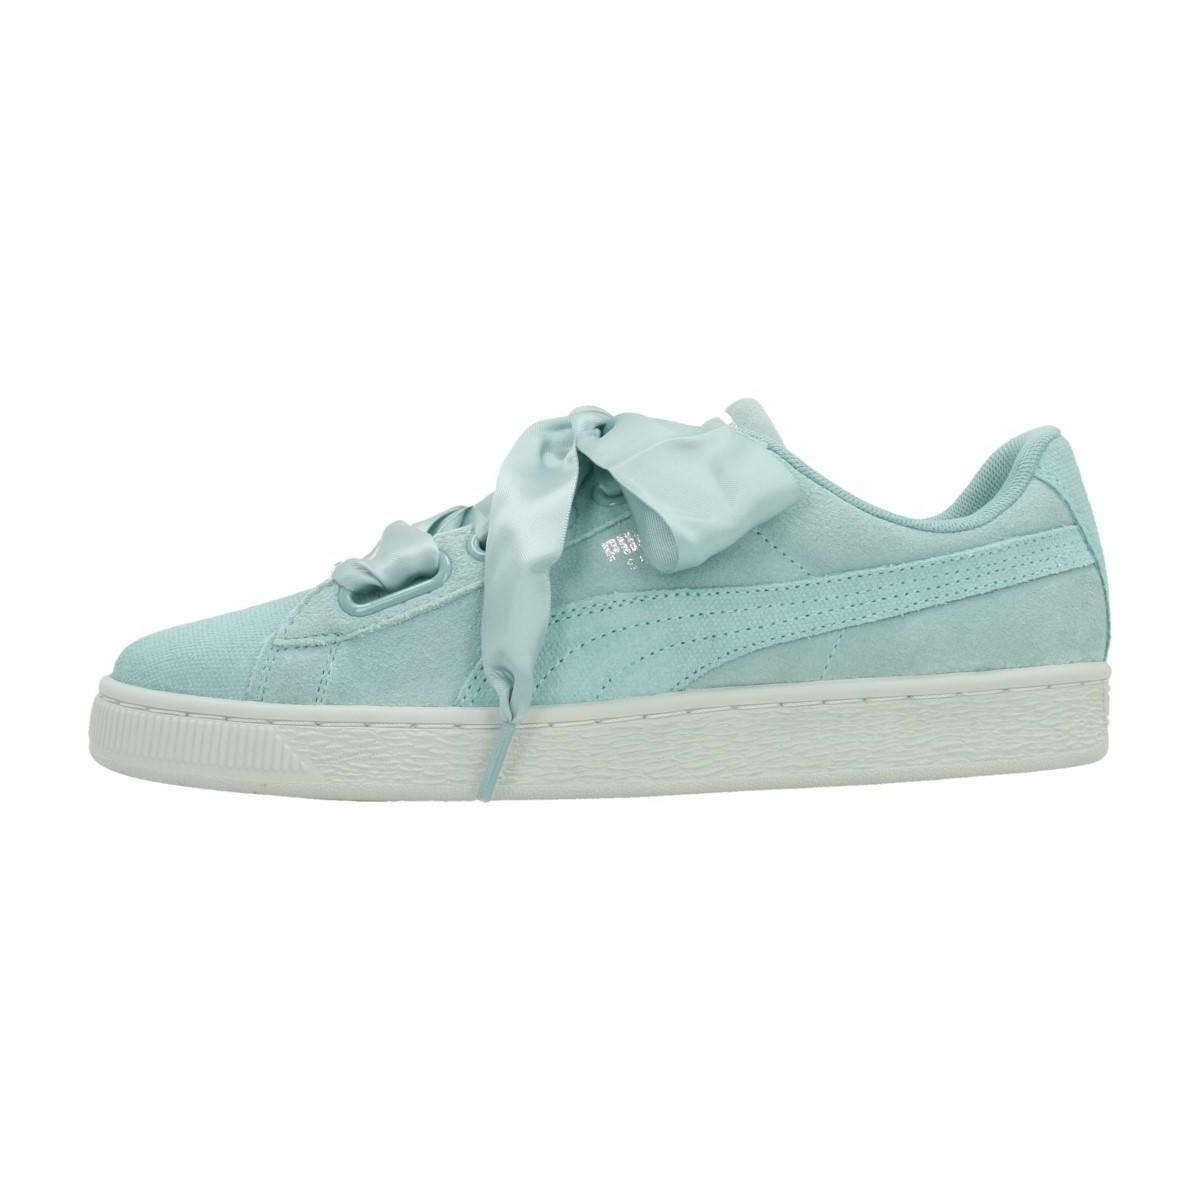 b372aceab0835b PUMA - Heart Pebble Women s Shoes (trainers) In Blue - Lyst. View fullscreen